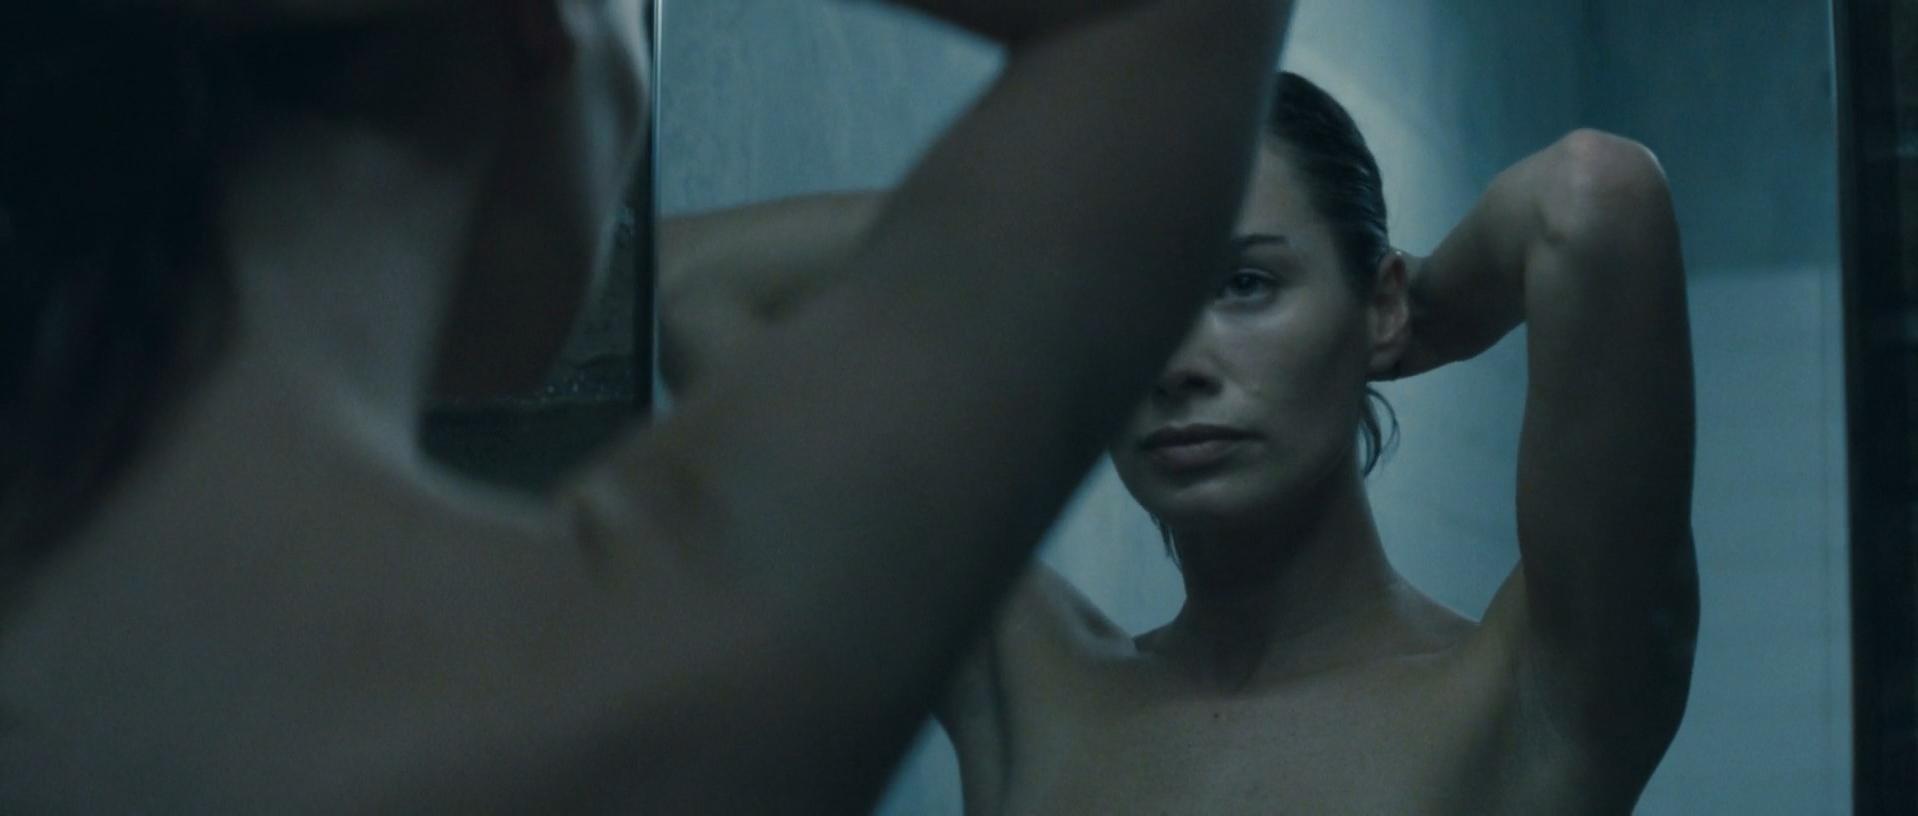 Lena Headey nude, Michelle Duncan nude - The Broken (2008)